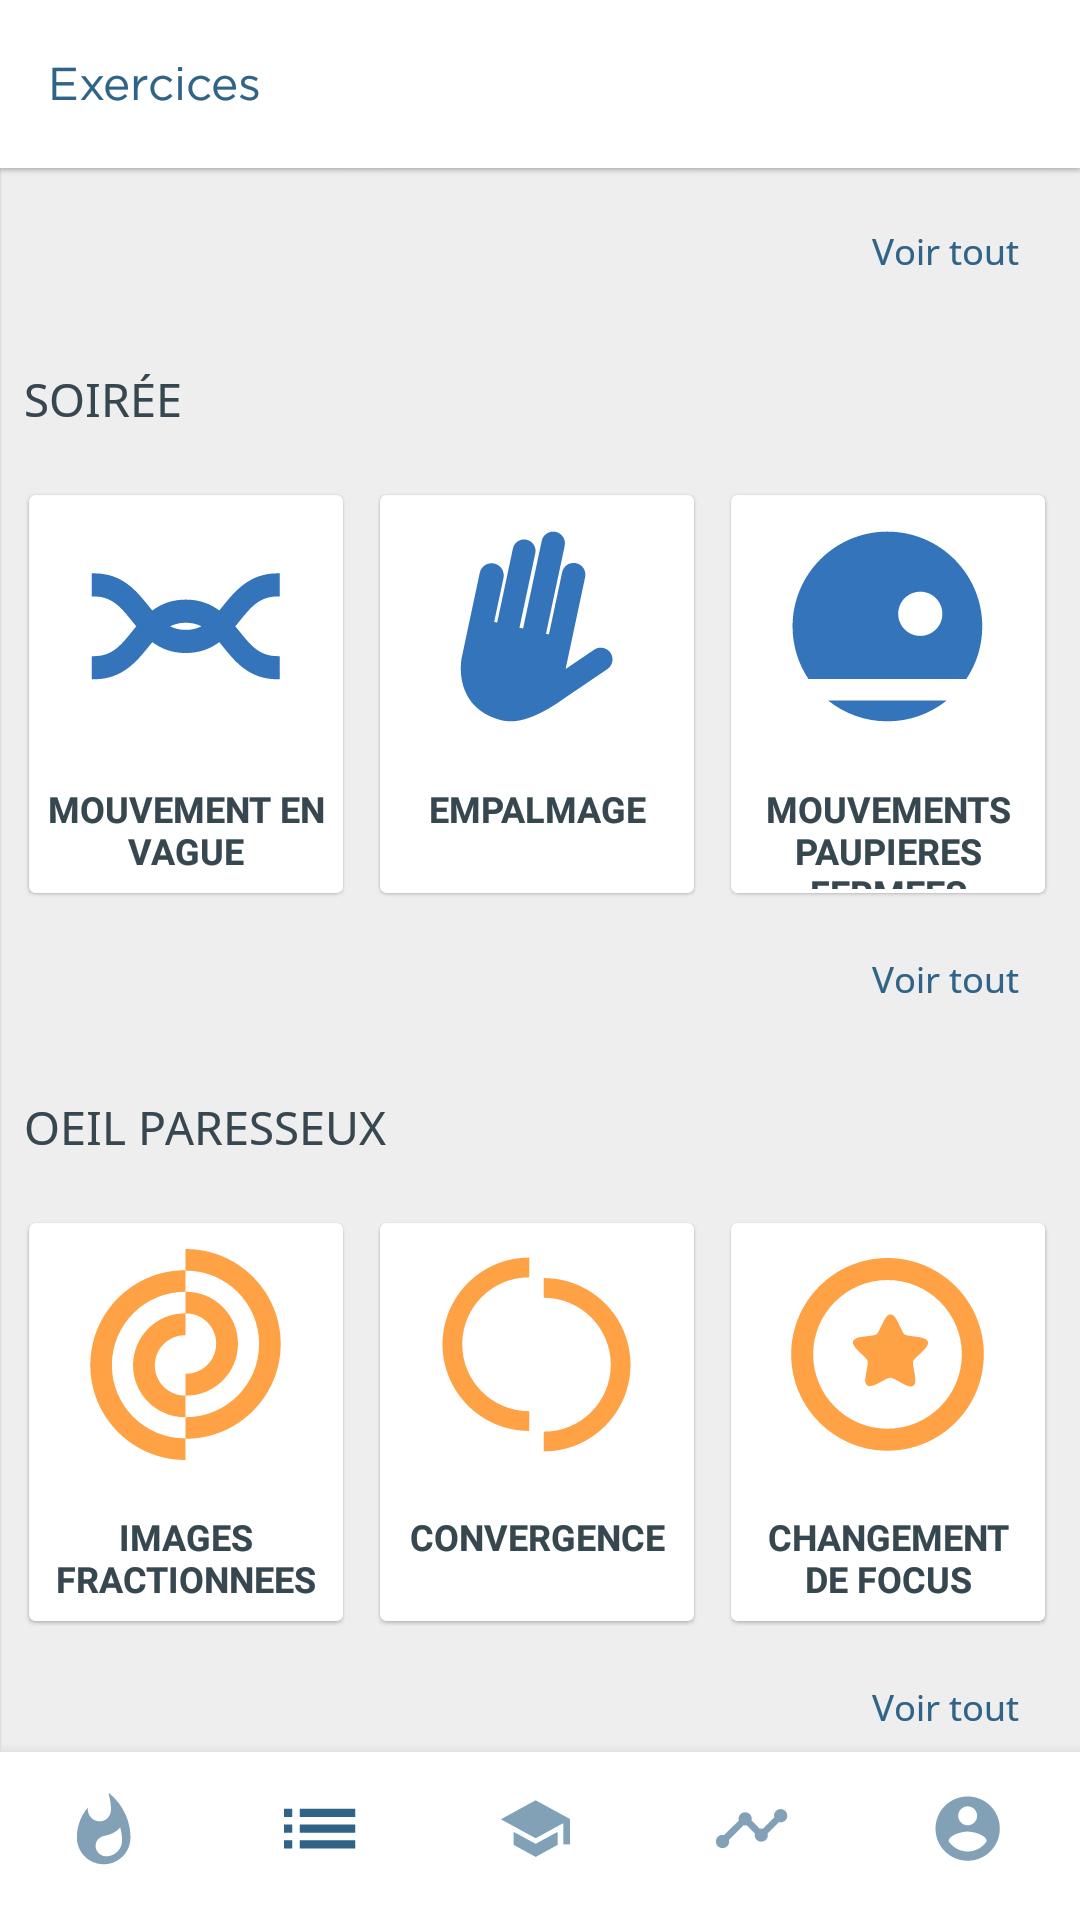 EyeCarePlus - Exercices 5